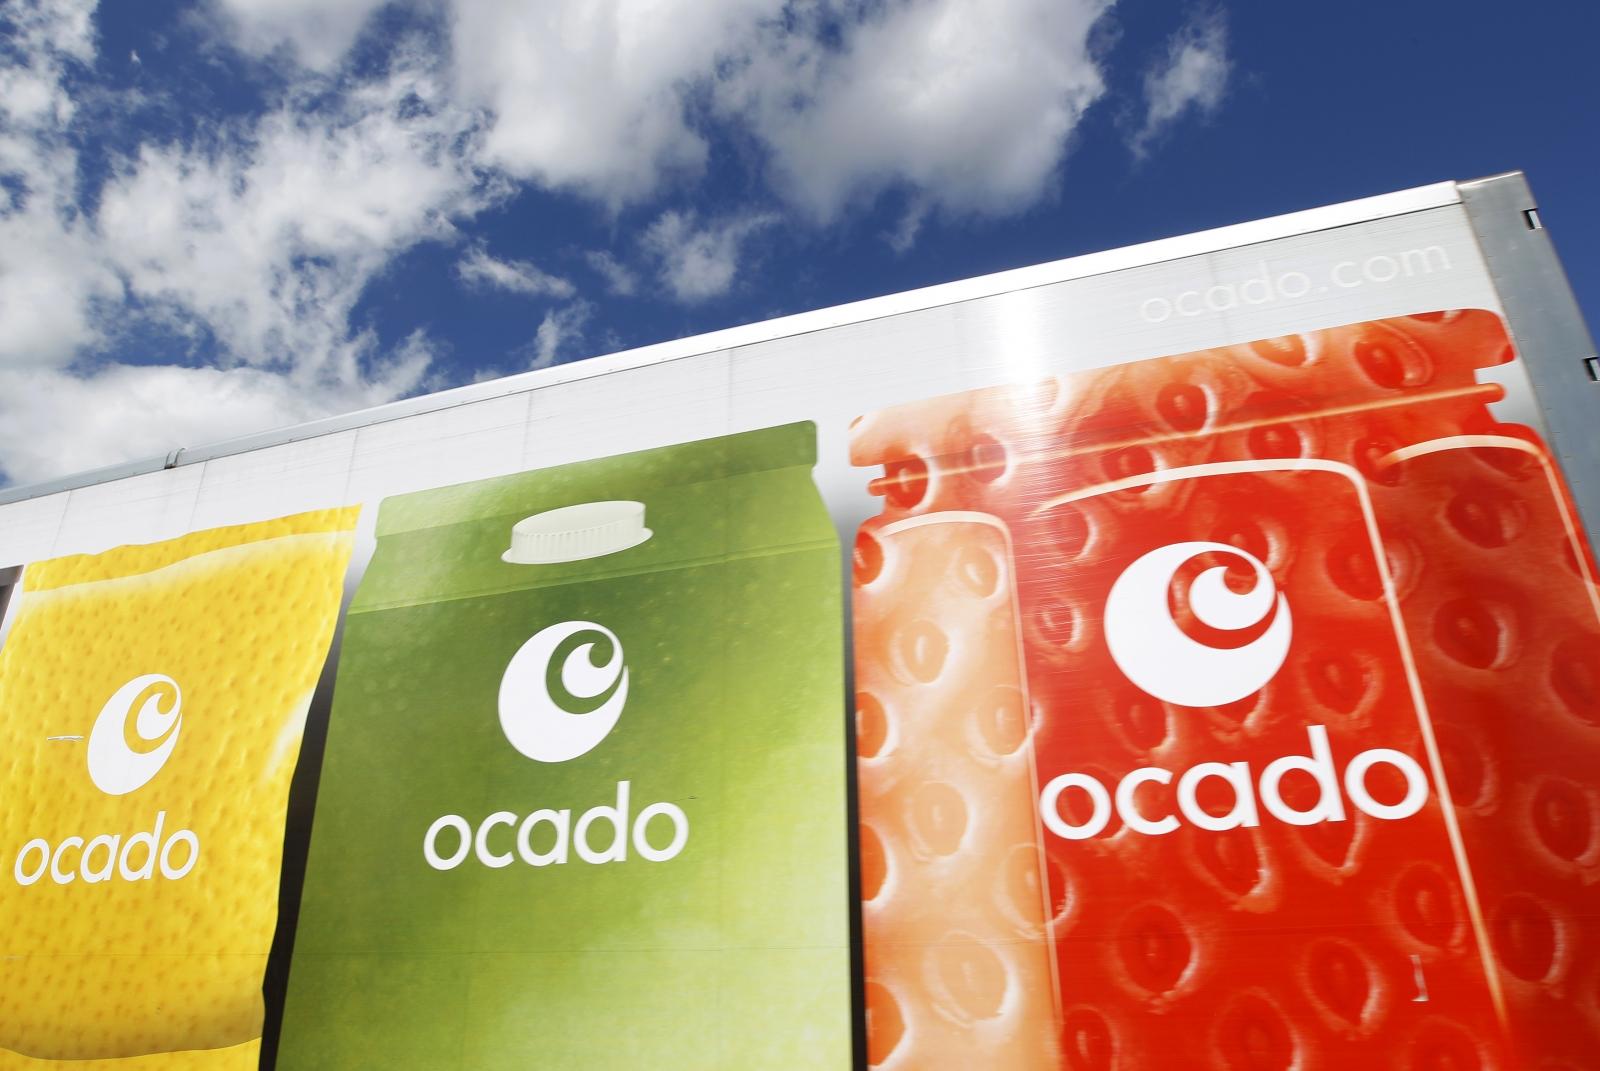 Ocado tests driveless delivery van